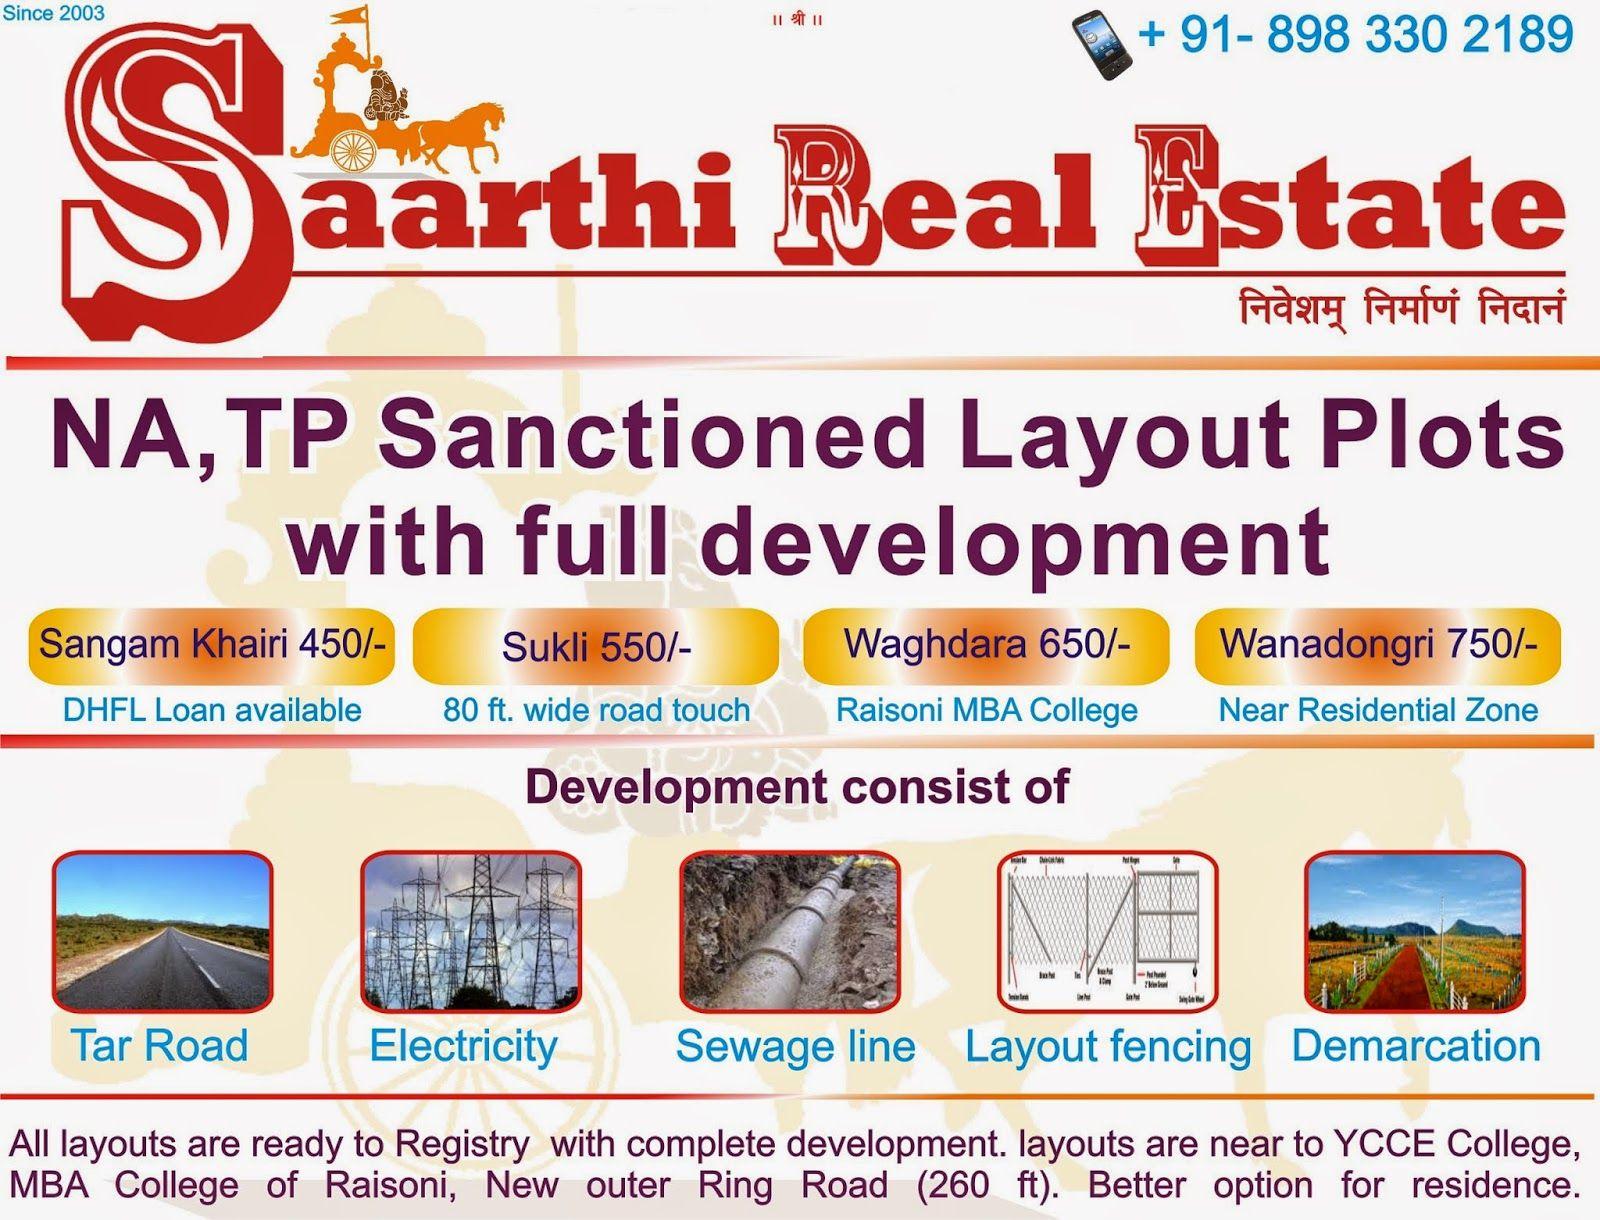 Saarthi Real Estate Nagpur Clear Title Rl Plots For Sale Plots For Sale Real Estate Best Investments